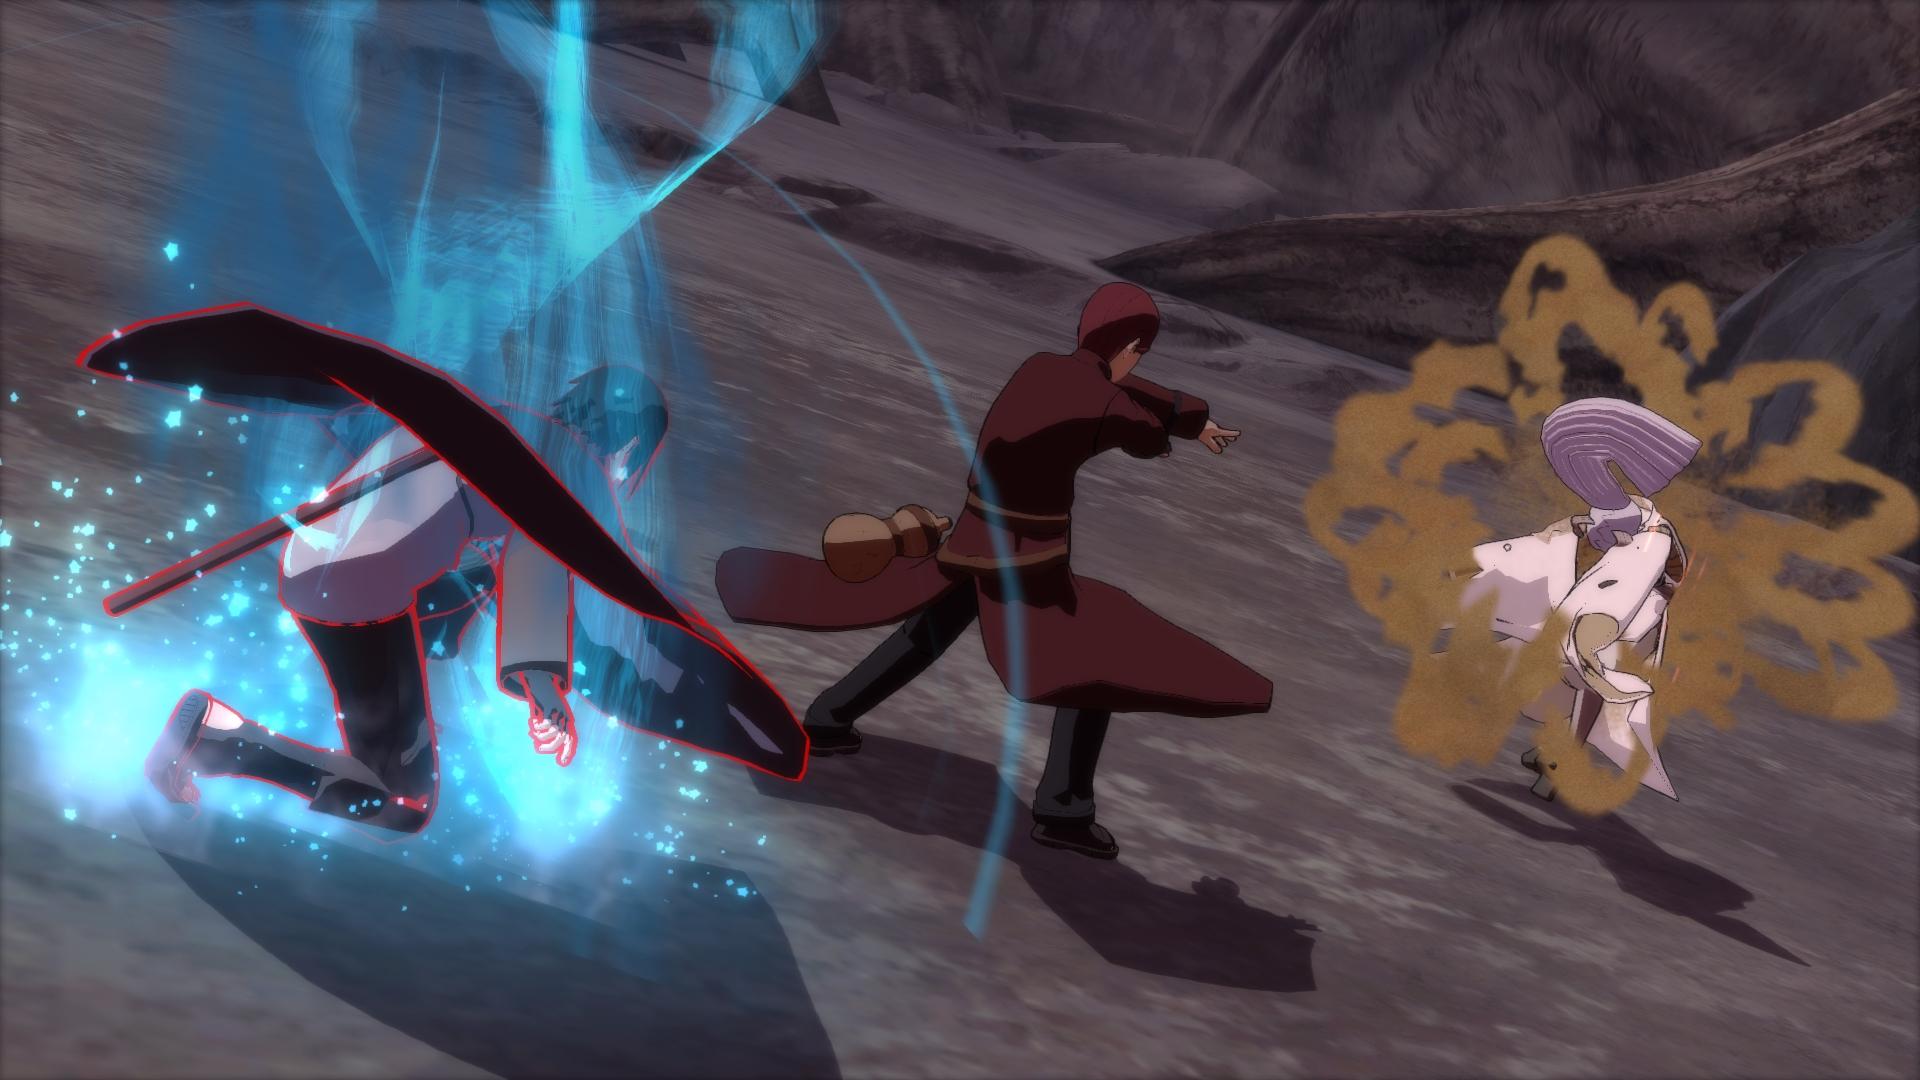 All Games Delta: Naruto Shippuden: Ultimate Ninja Storm 4 Road to